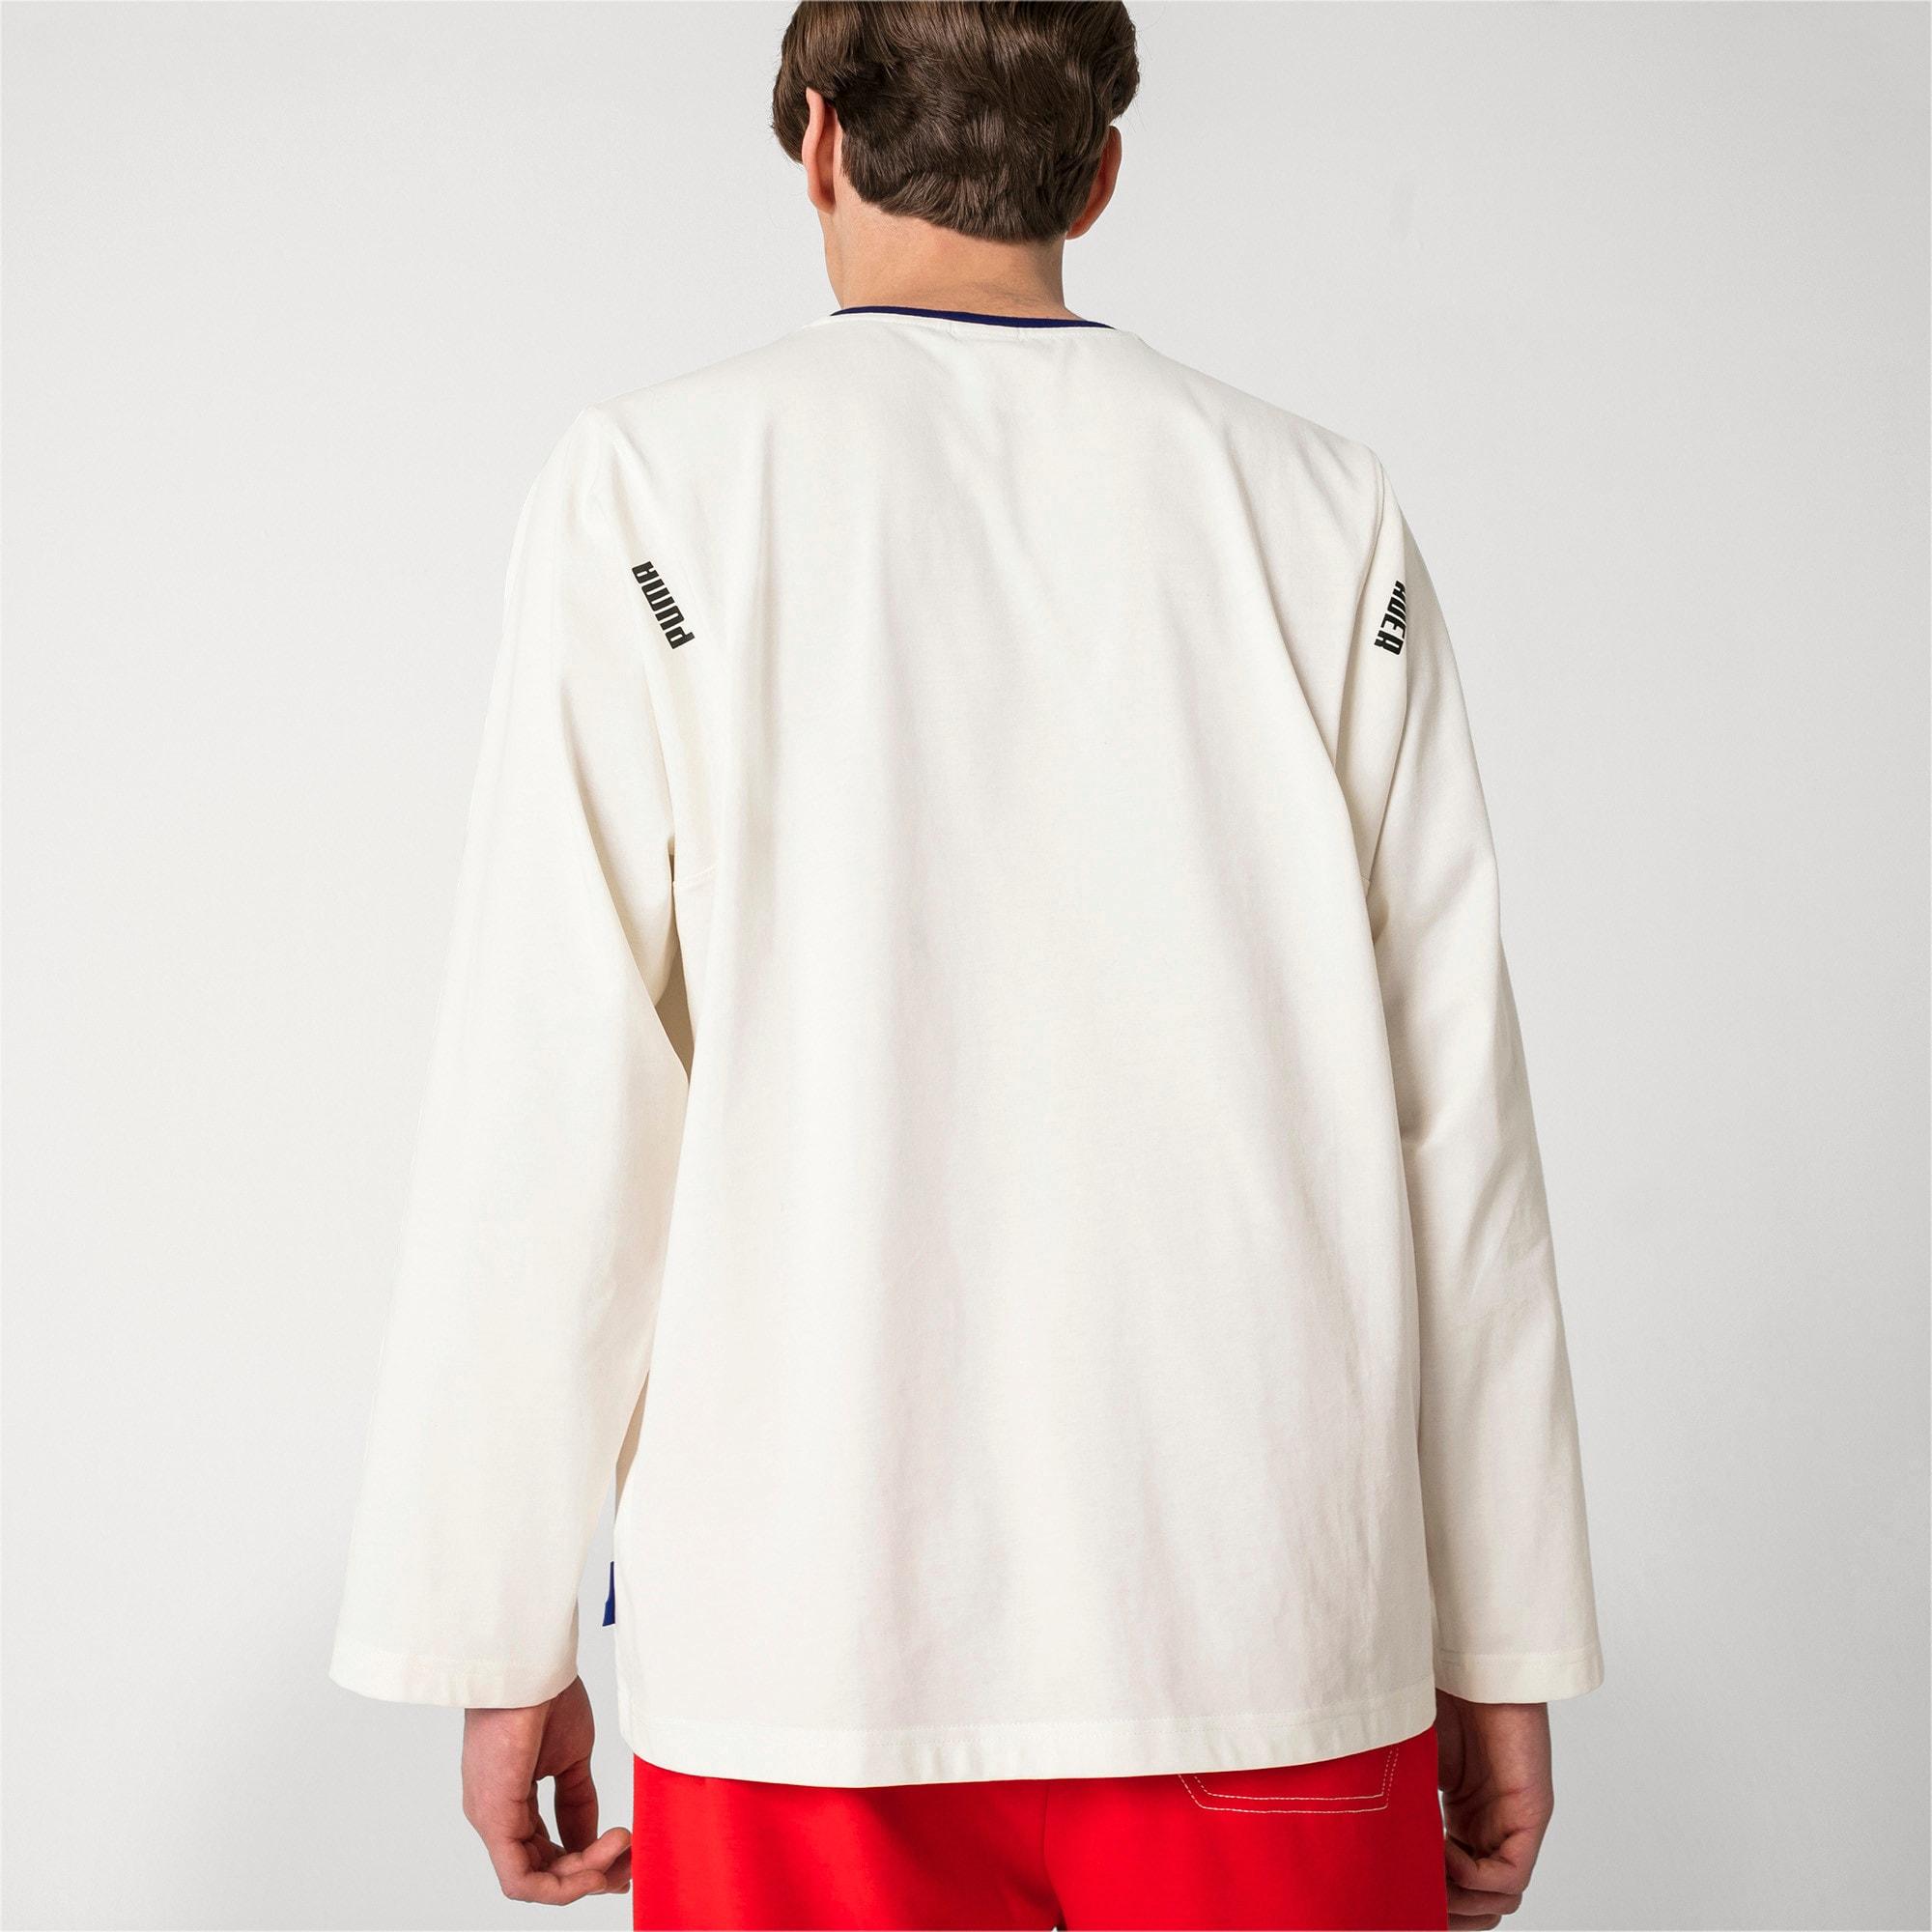 Thumbnail 3 of PUMA x ADER ERROR Langarm-Shirt, Whisper White, medium